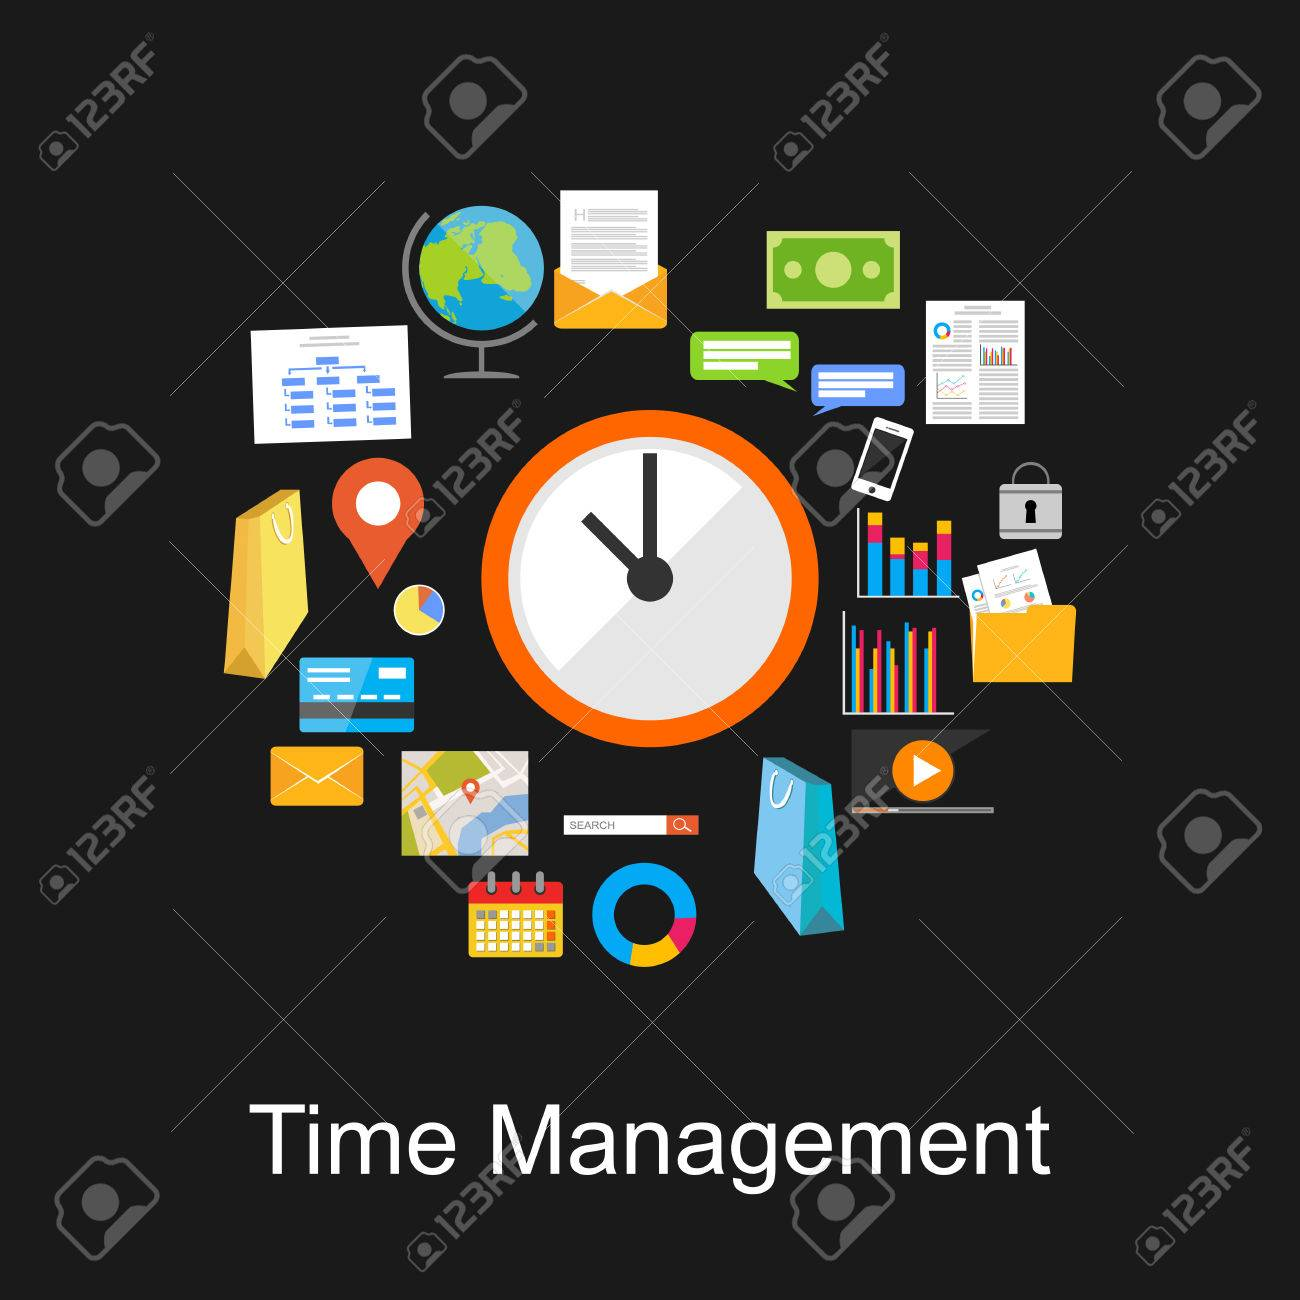 Time management concept illustration. - 45001925